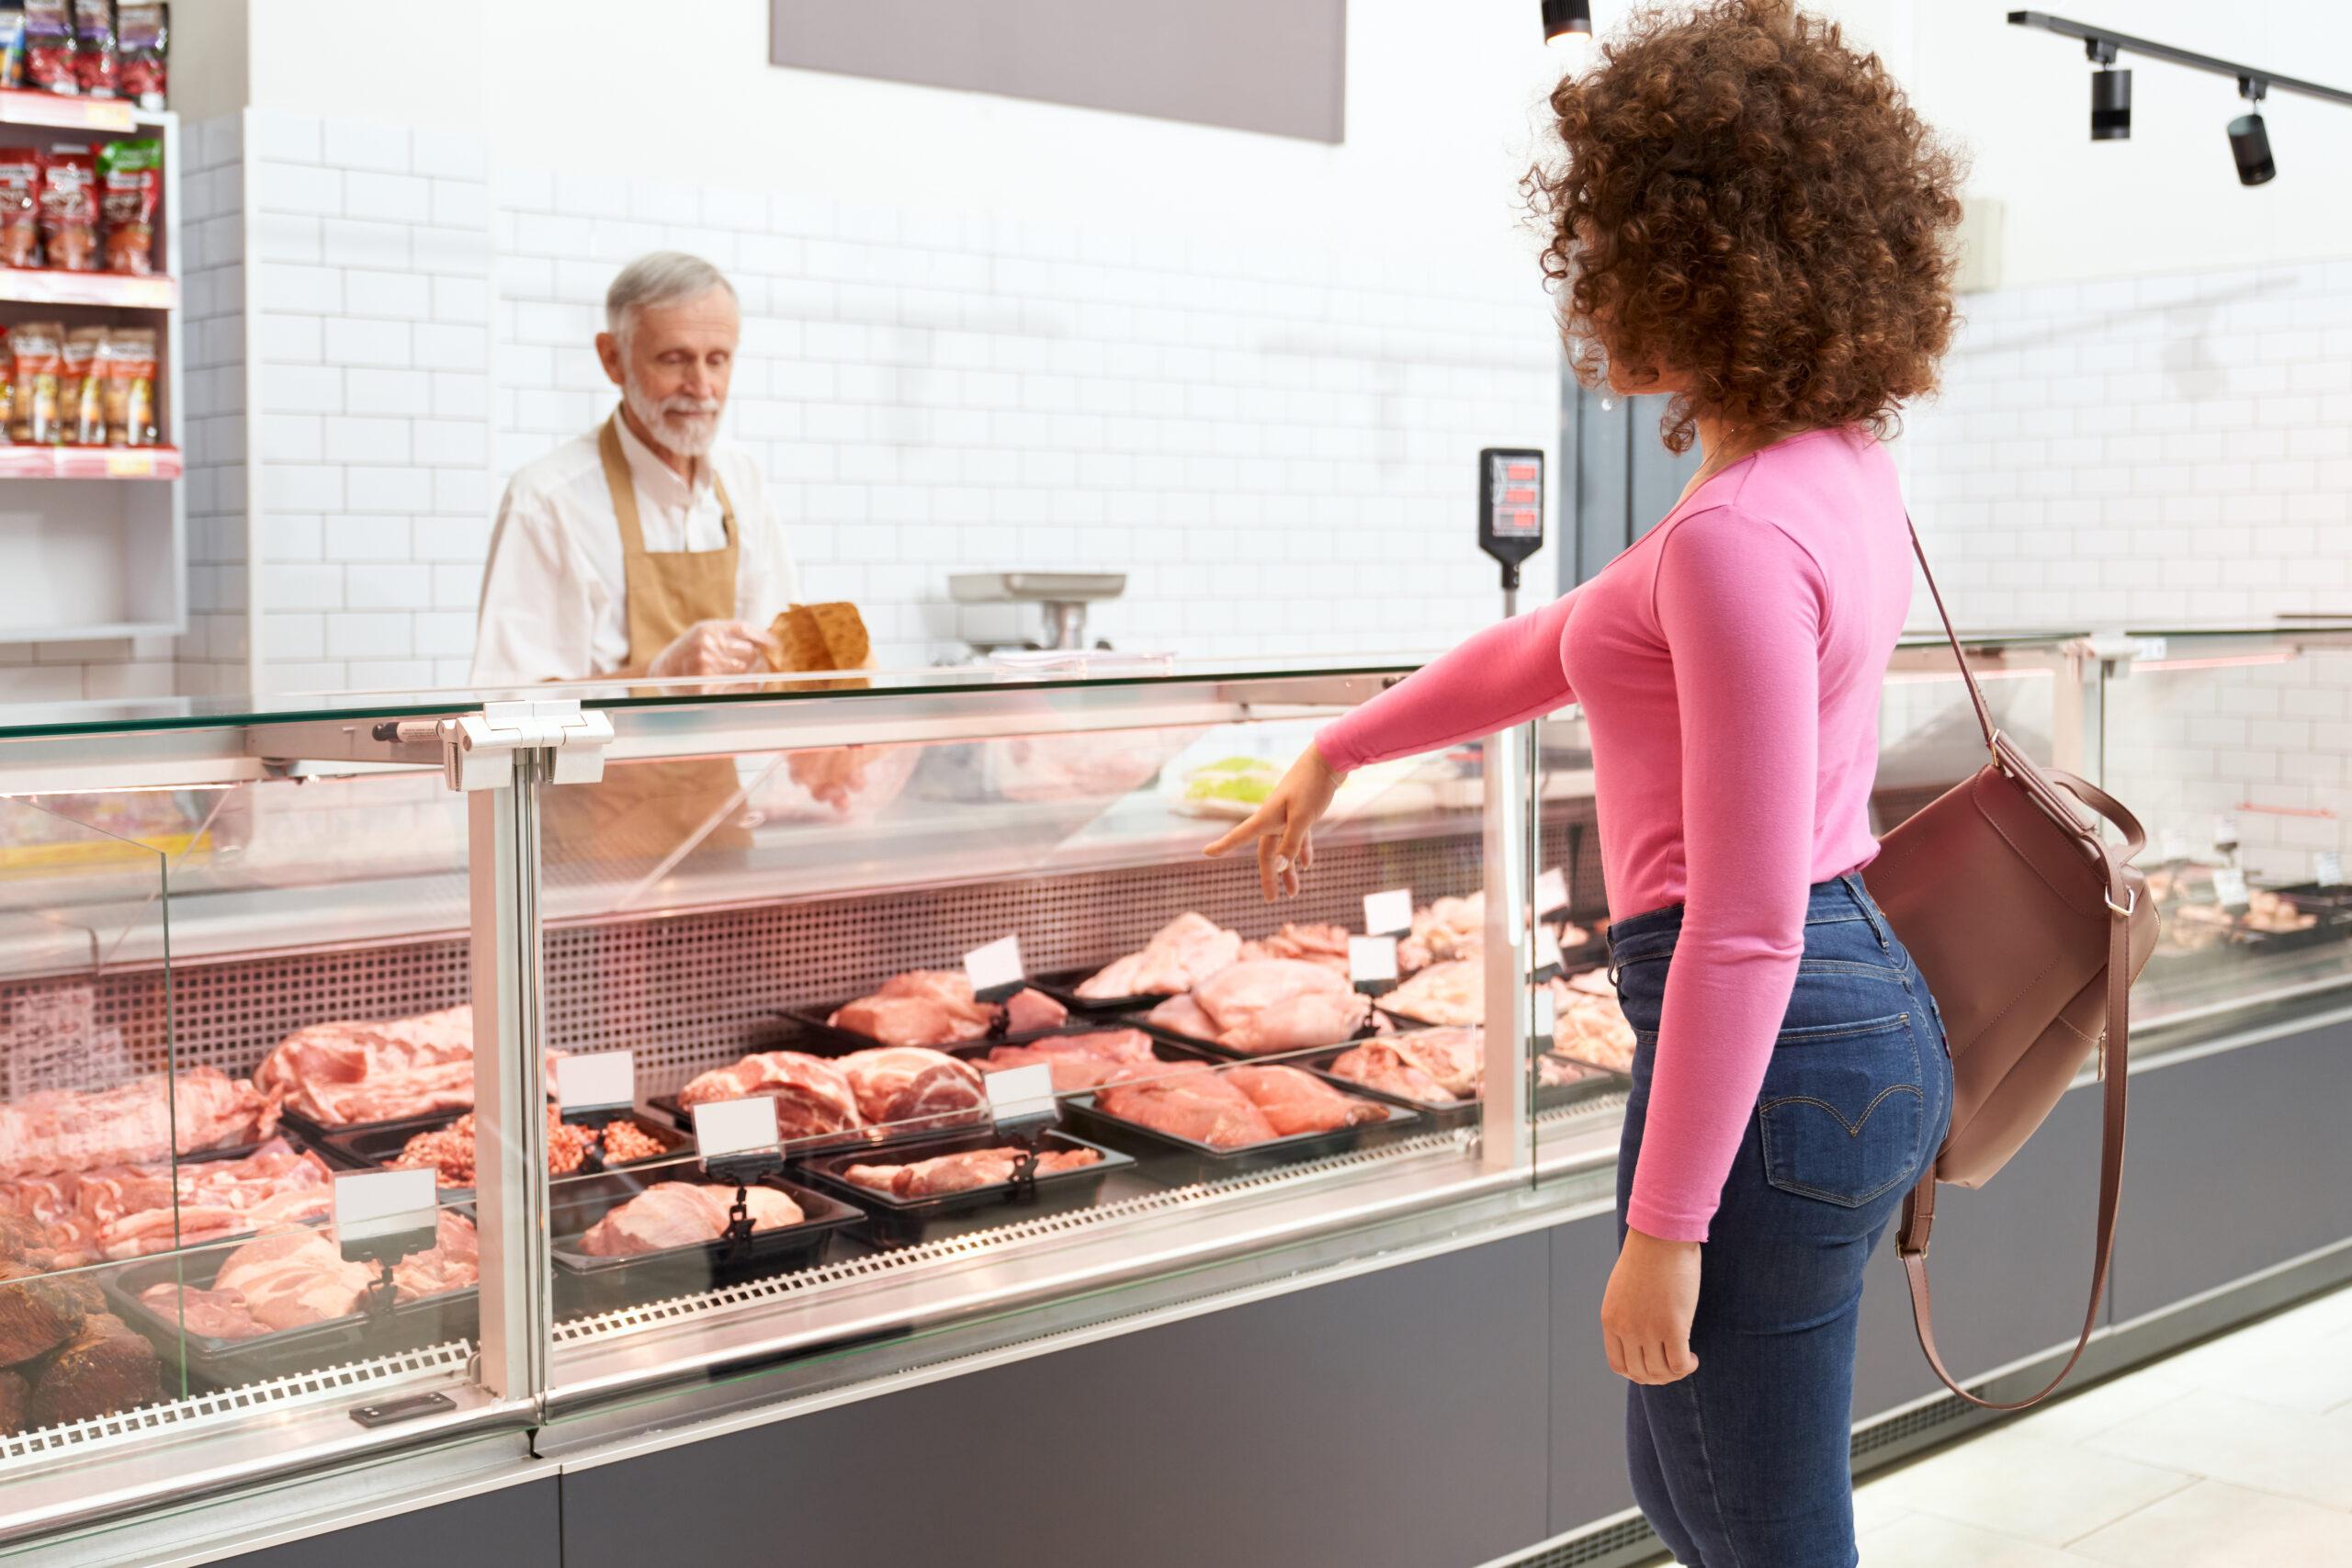 senior-butcher-waiting-for-order-GLCVR29-scaled Chi siamo